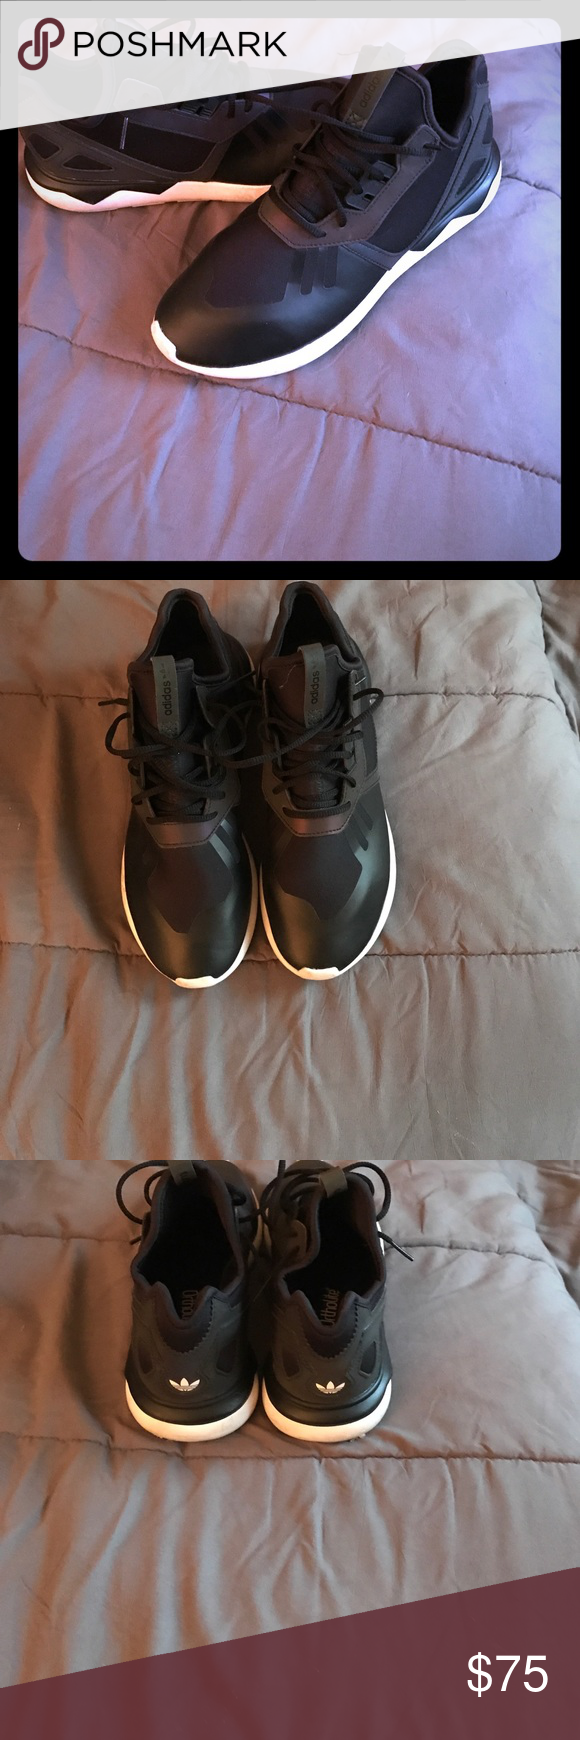 Adidas tubular black and metallic purple adidas tubular Adidas Shoes Sneakers